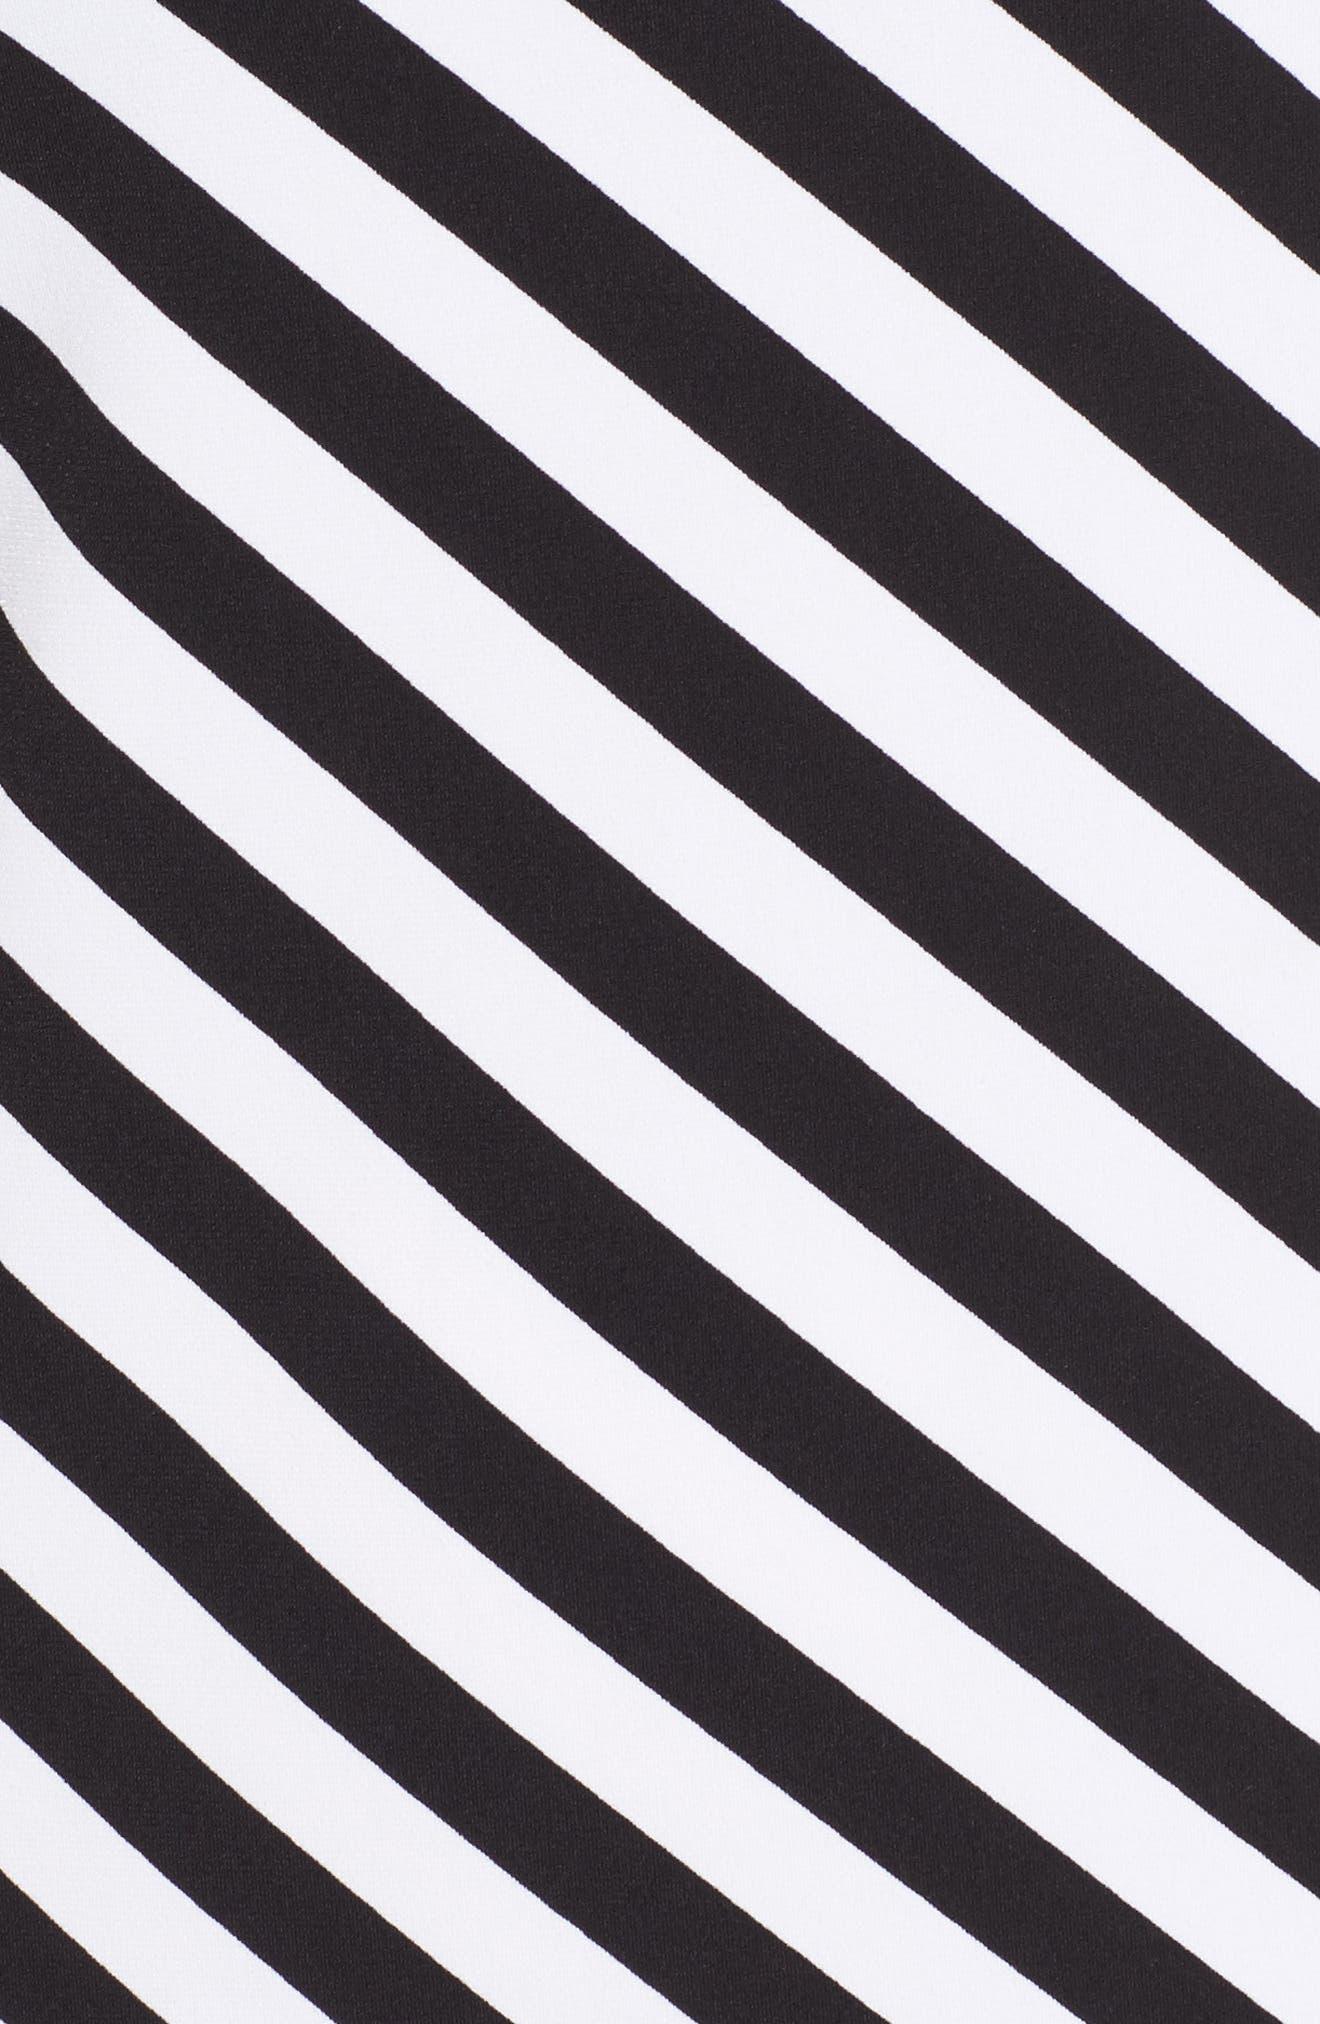 Tulip Sleeve Stripe Dress,                             Alternate thumbnail 5, color,                             Black/ White